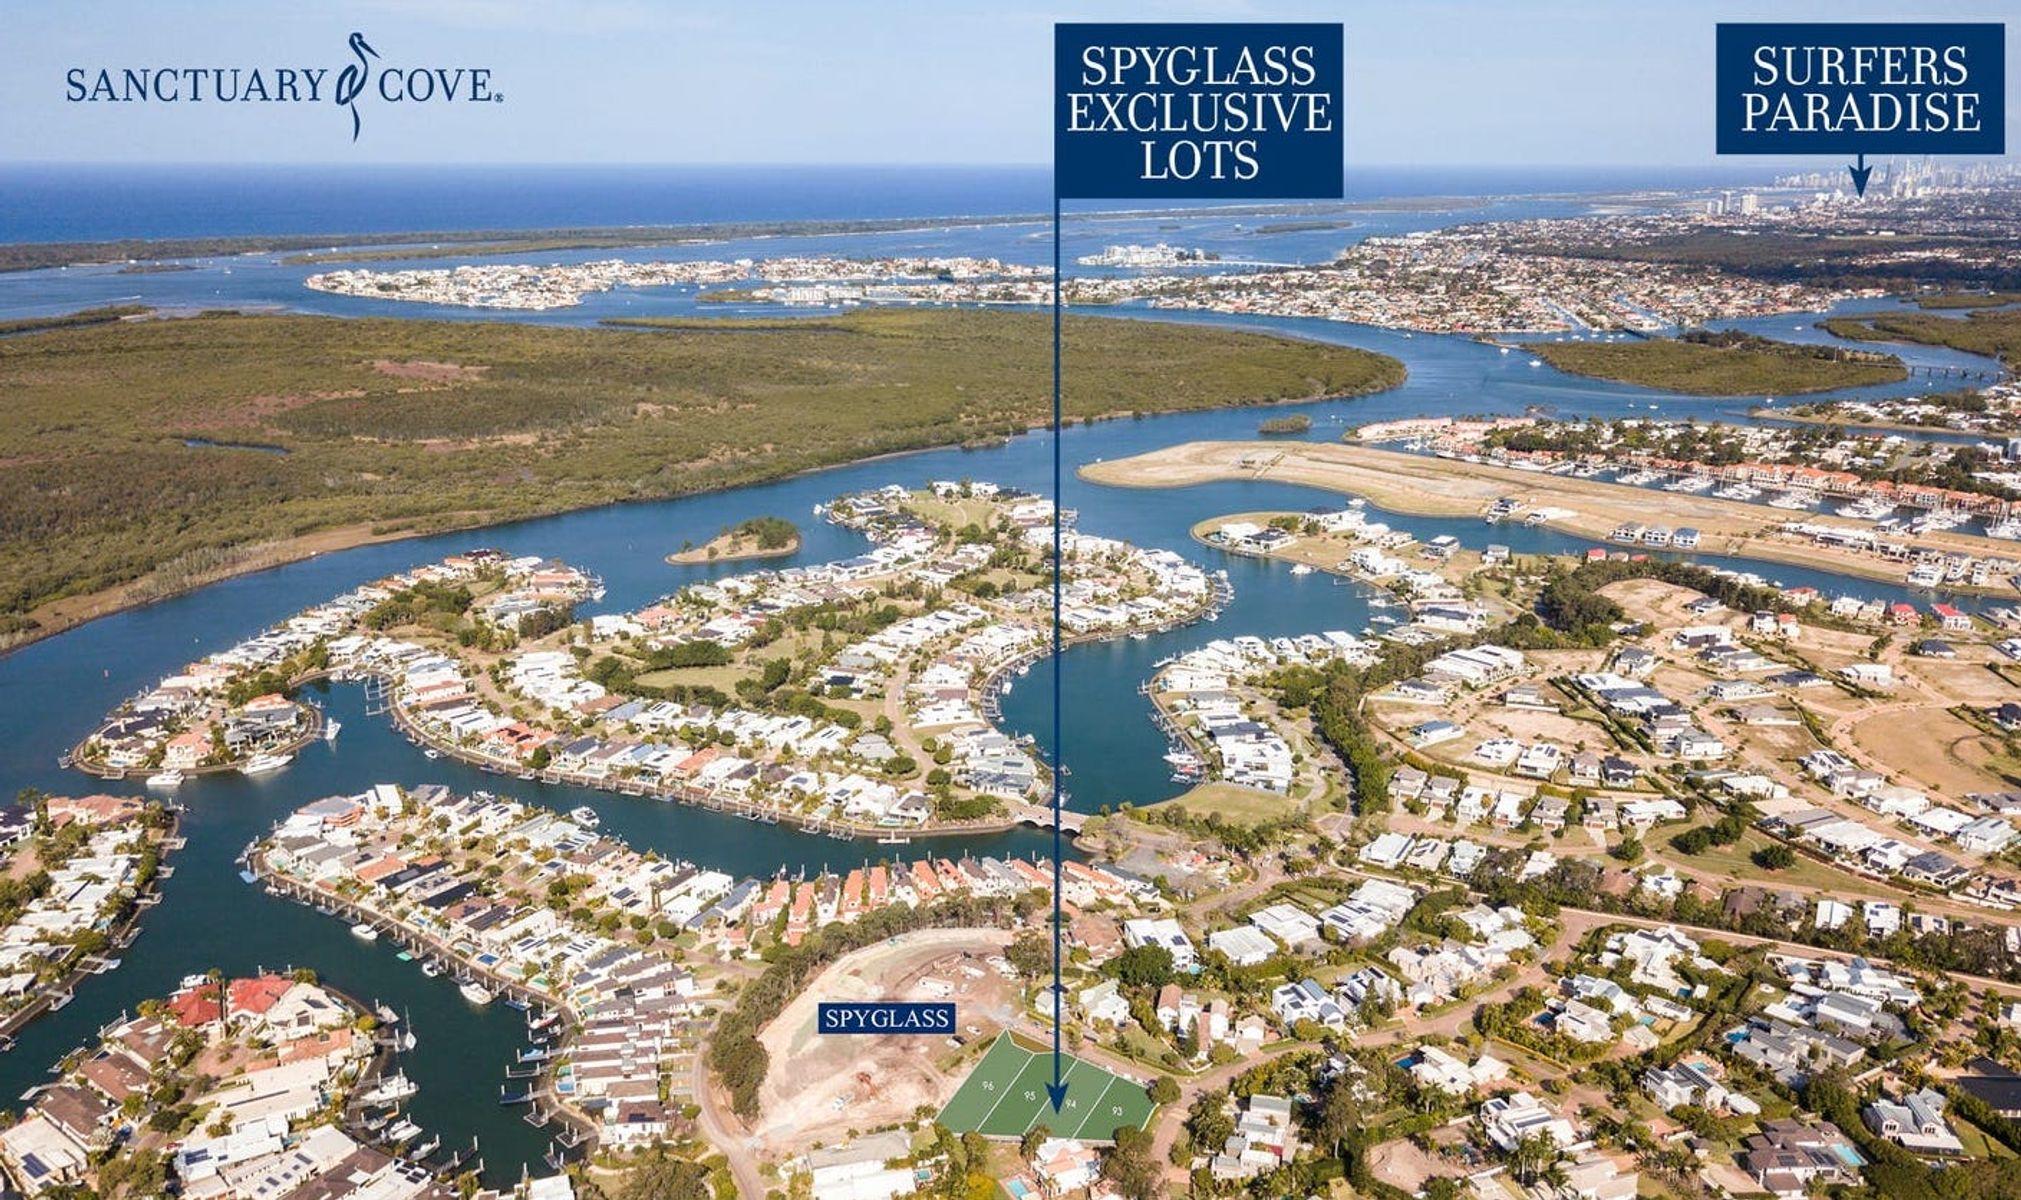 6278 Spyglass Hill, Sanctuary Cove, QLD 4212